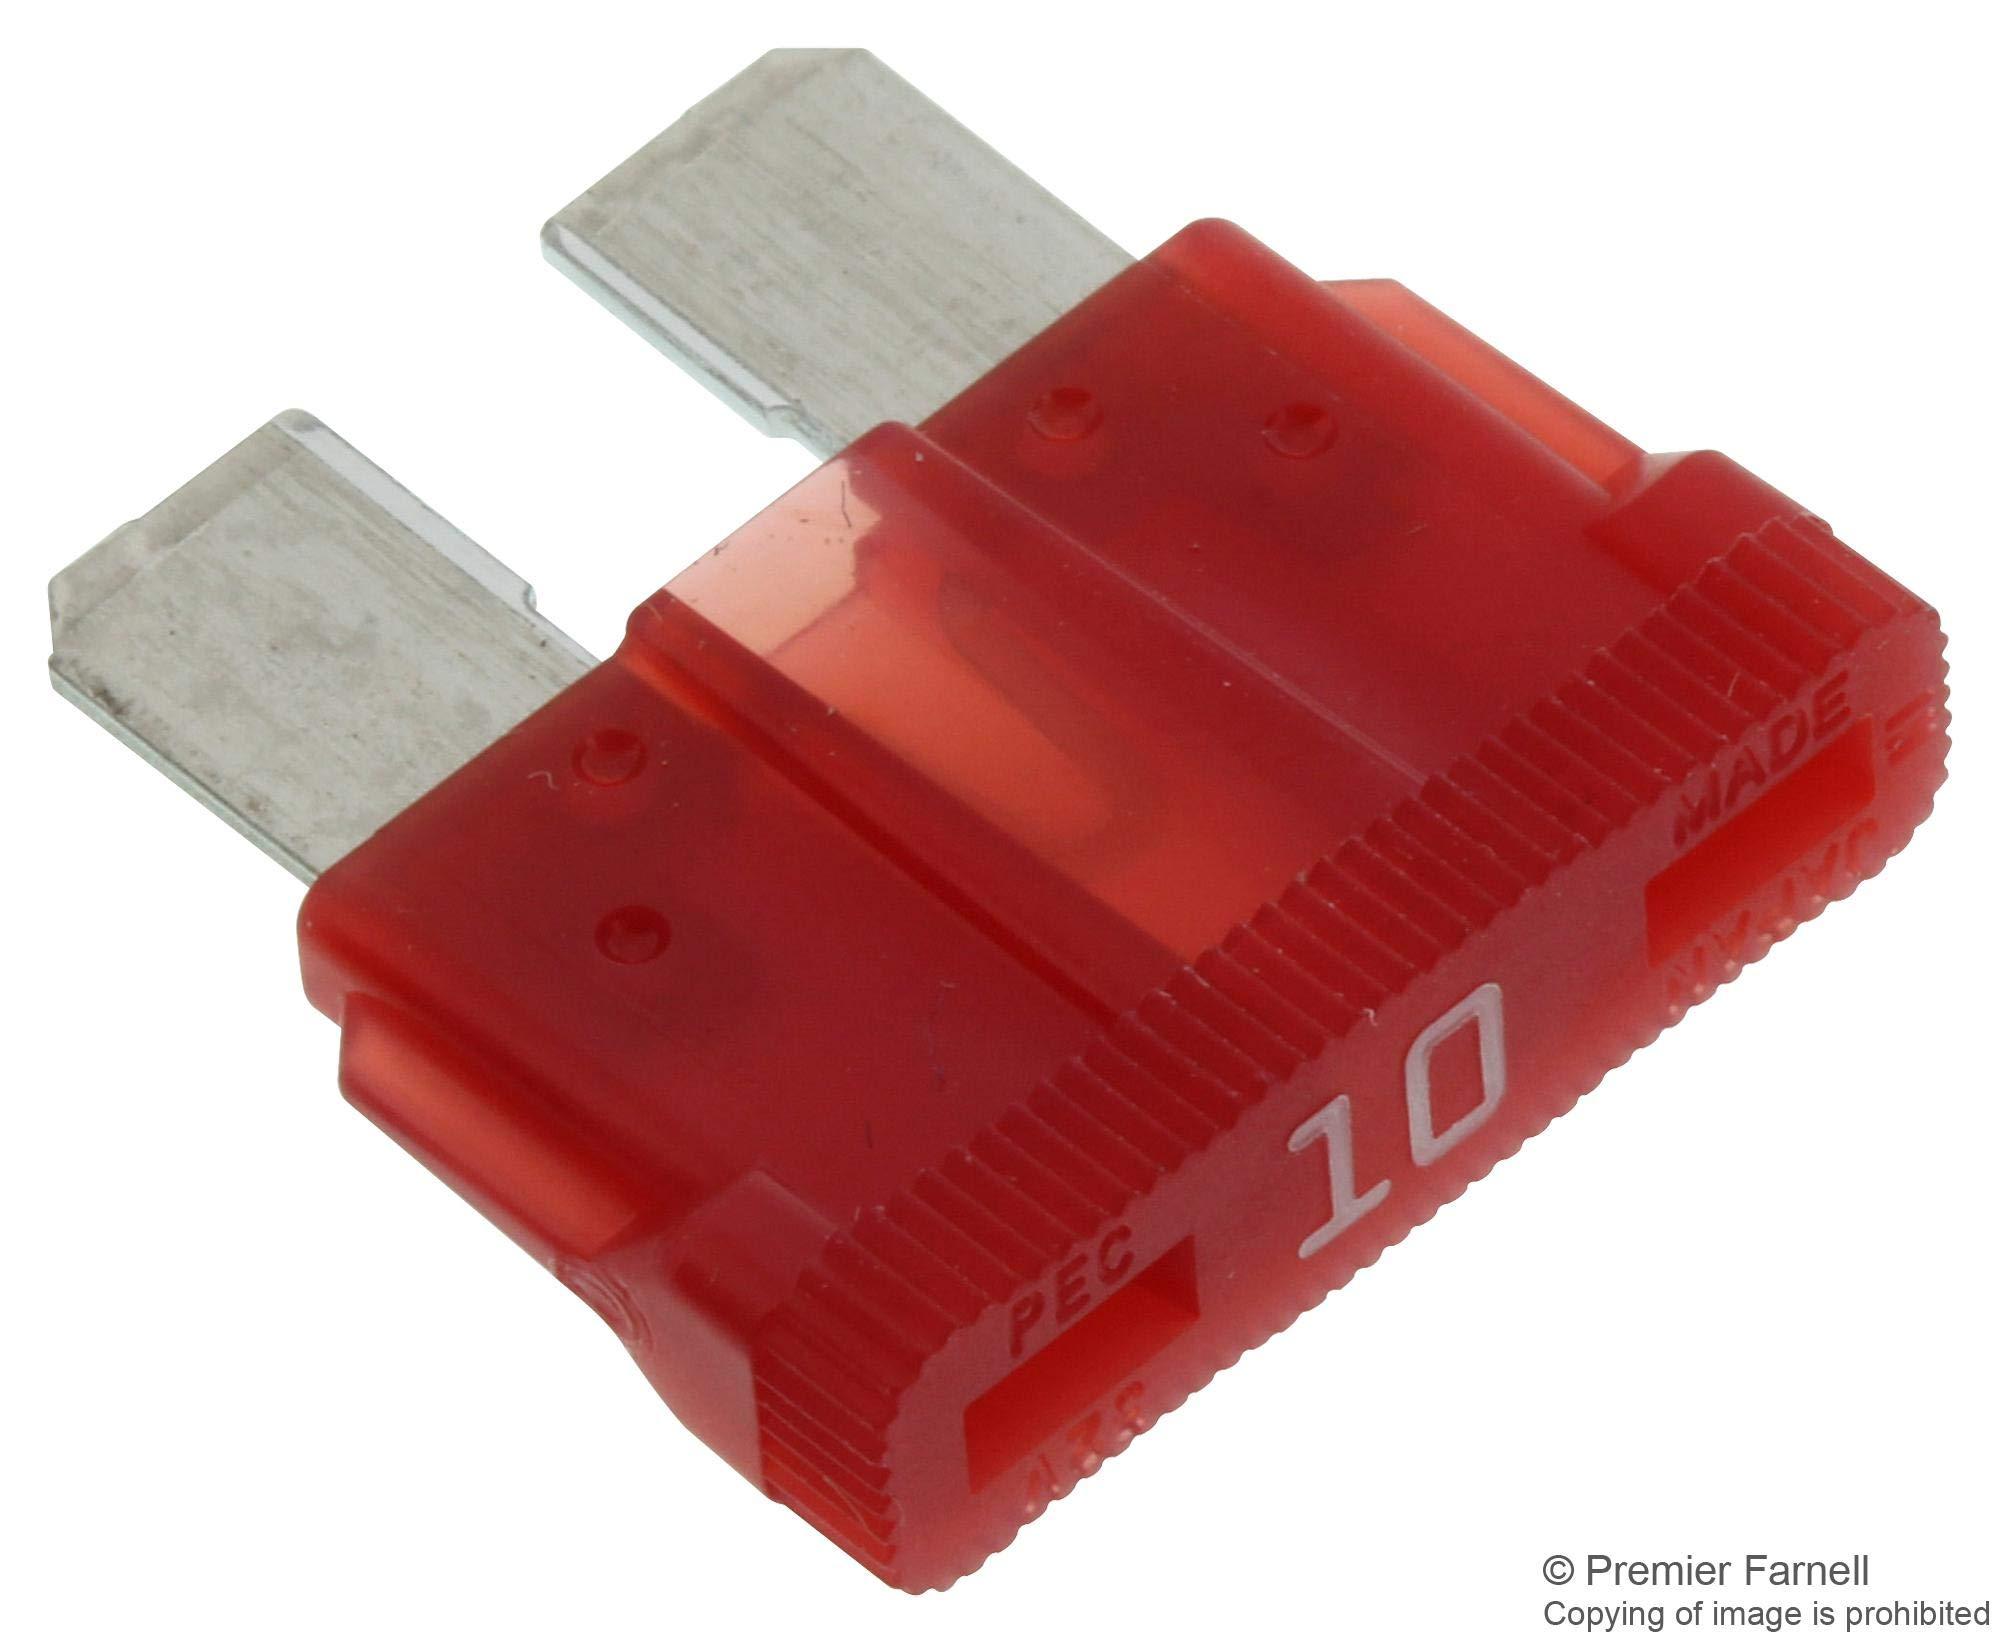 BK/ATC-10 - Fuse, Automotive, Fast Acting, 10 A, 32 V, 19.1mm x 5mm x 19mm, ATC Series (BK/ATC-10) (Pack of 50)